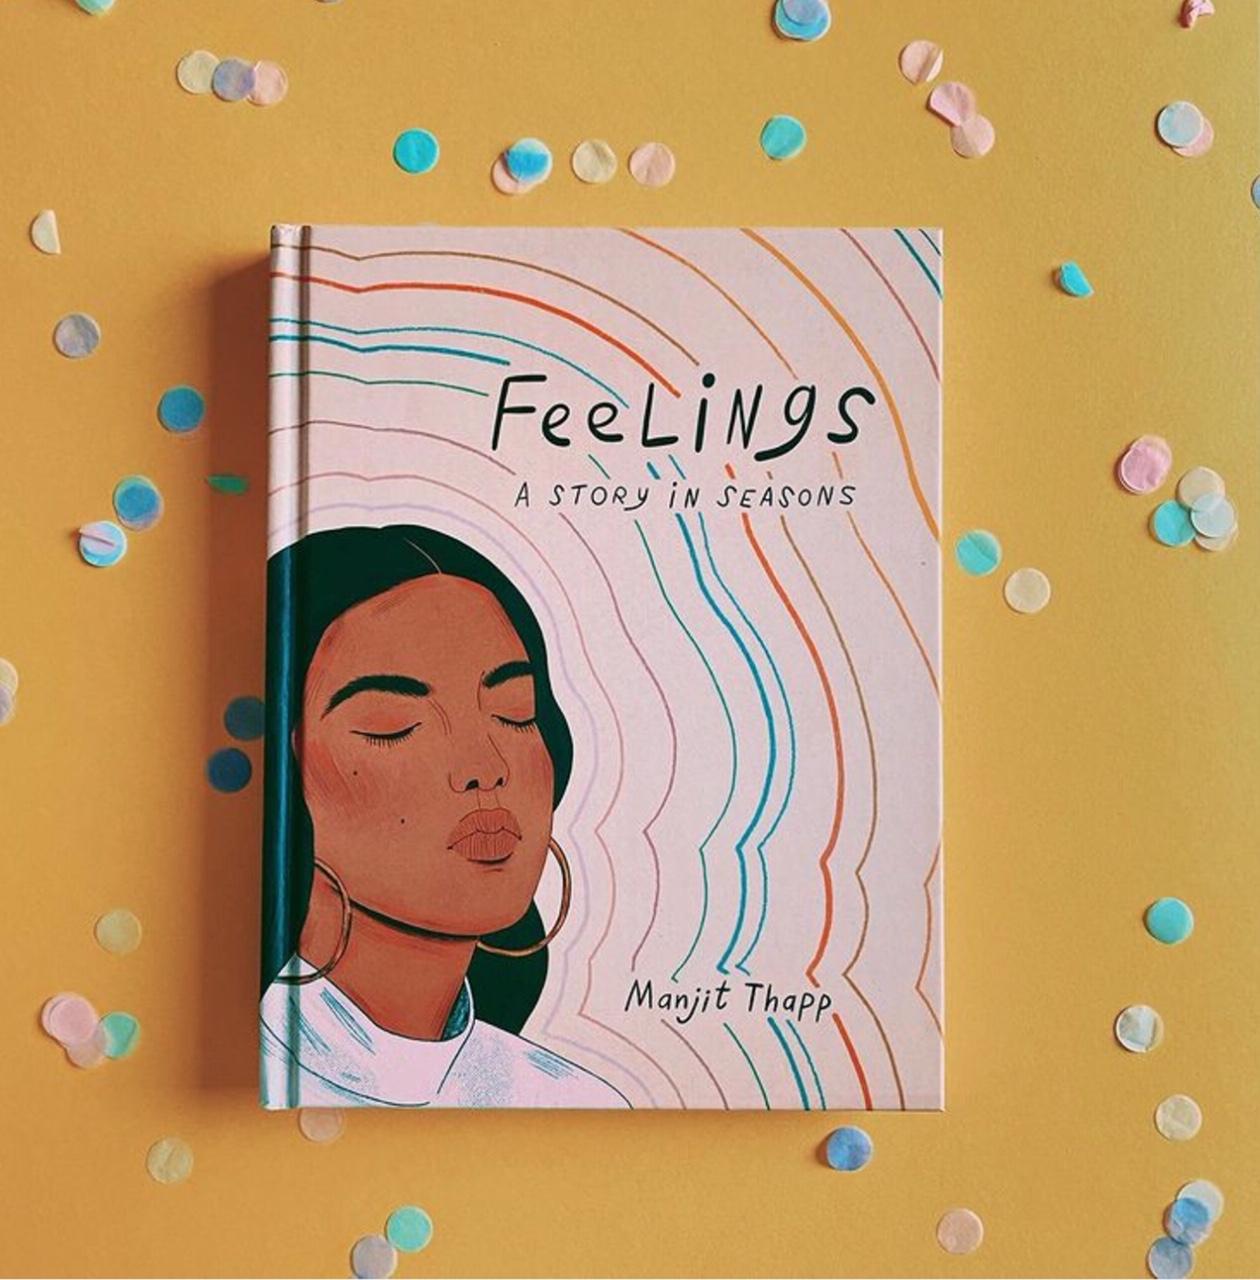 Manjit Thapp Feelings book